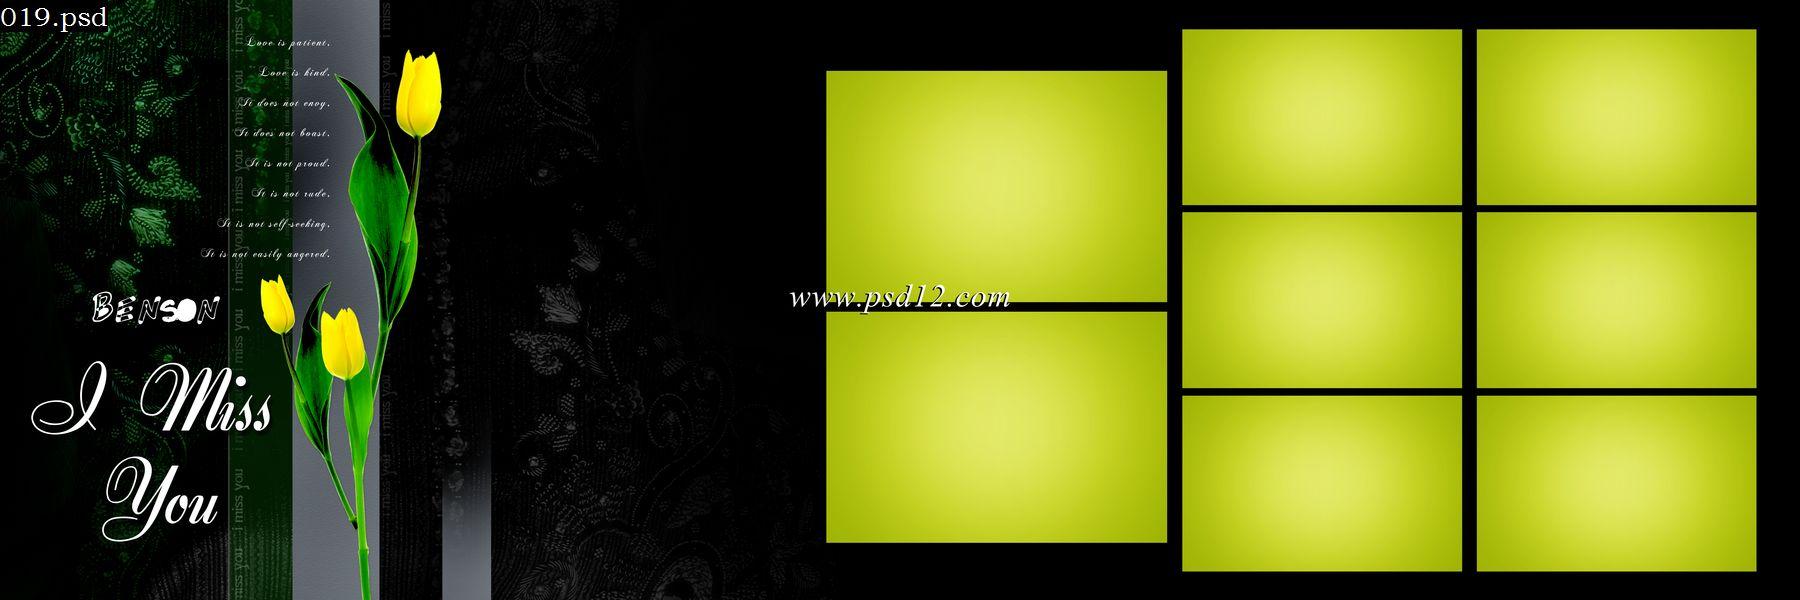 Karizma PSD Design